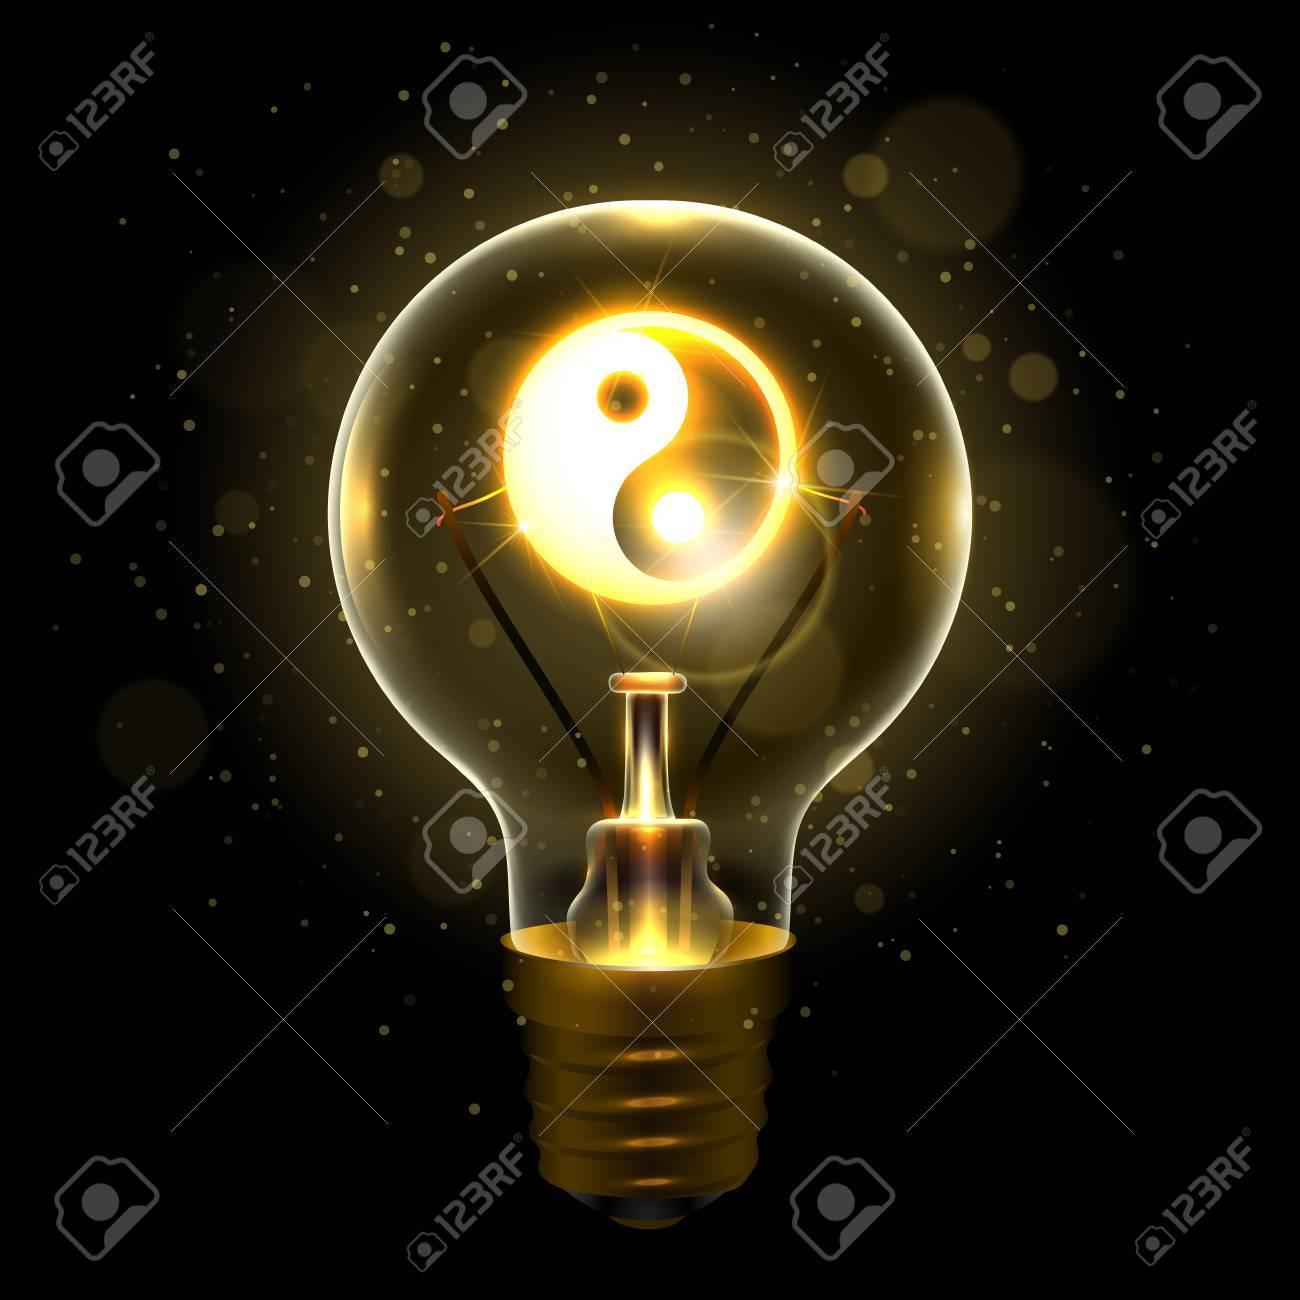 Realistic lamp with the yin yang symbol royalty free cliparts realistic lamp with the yin yang symbol stock vector 89334144 buycottarizona Choice Image